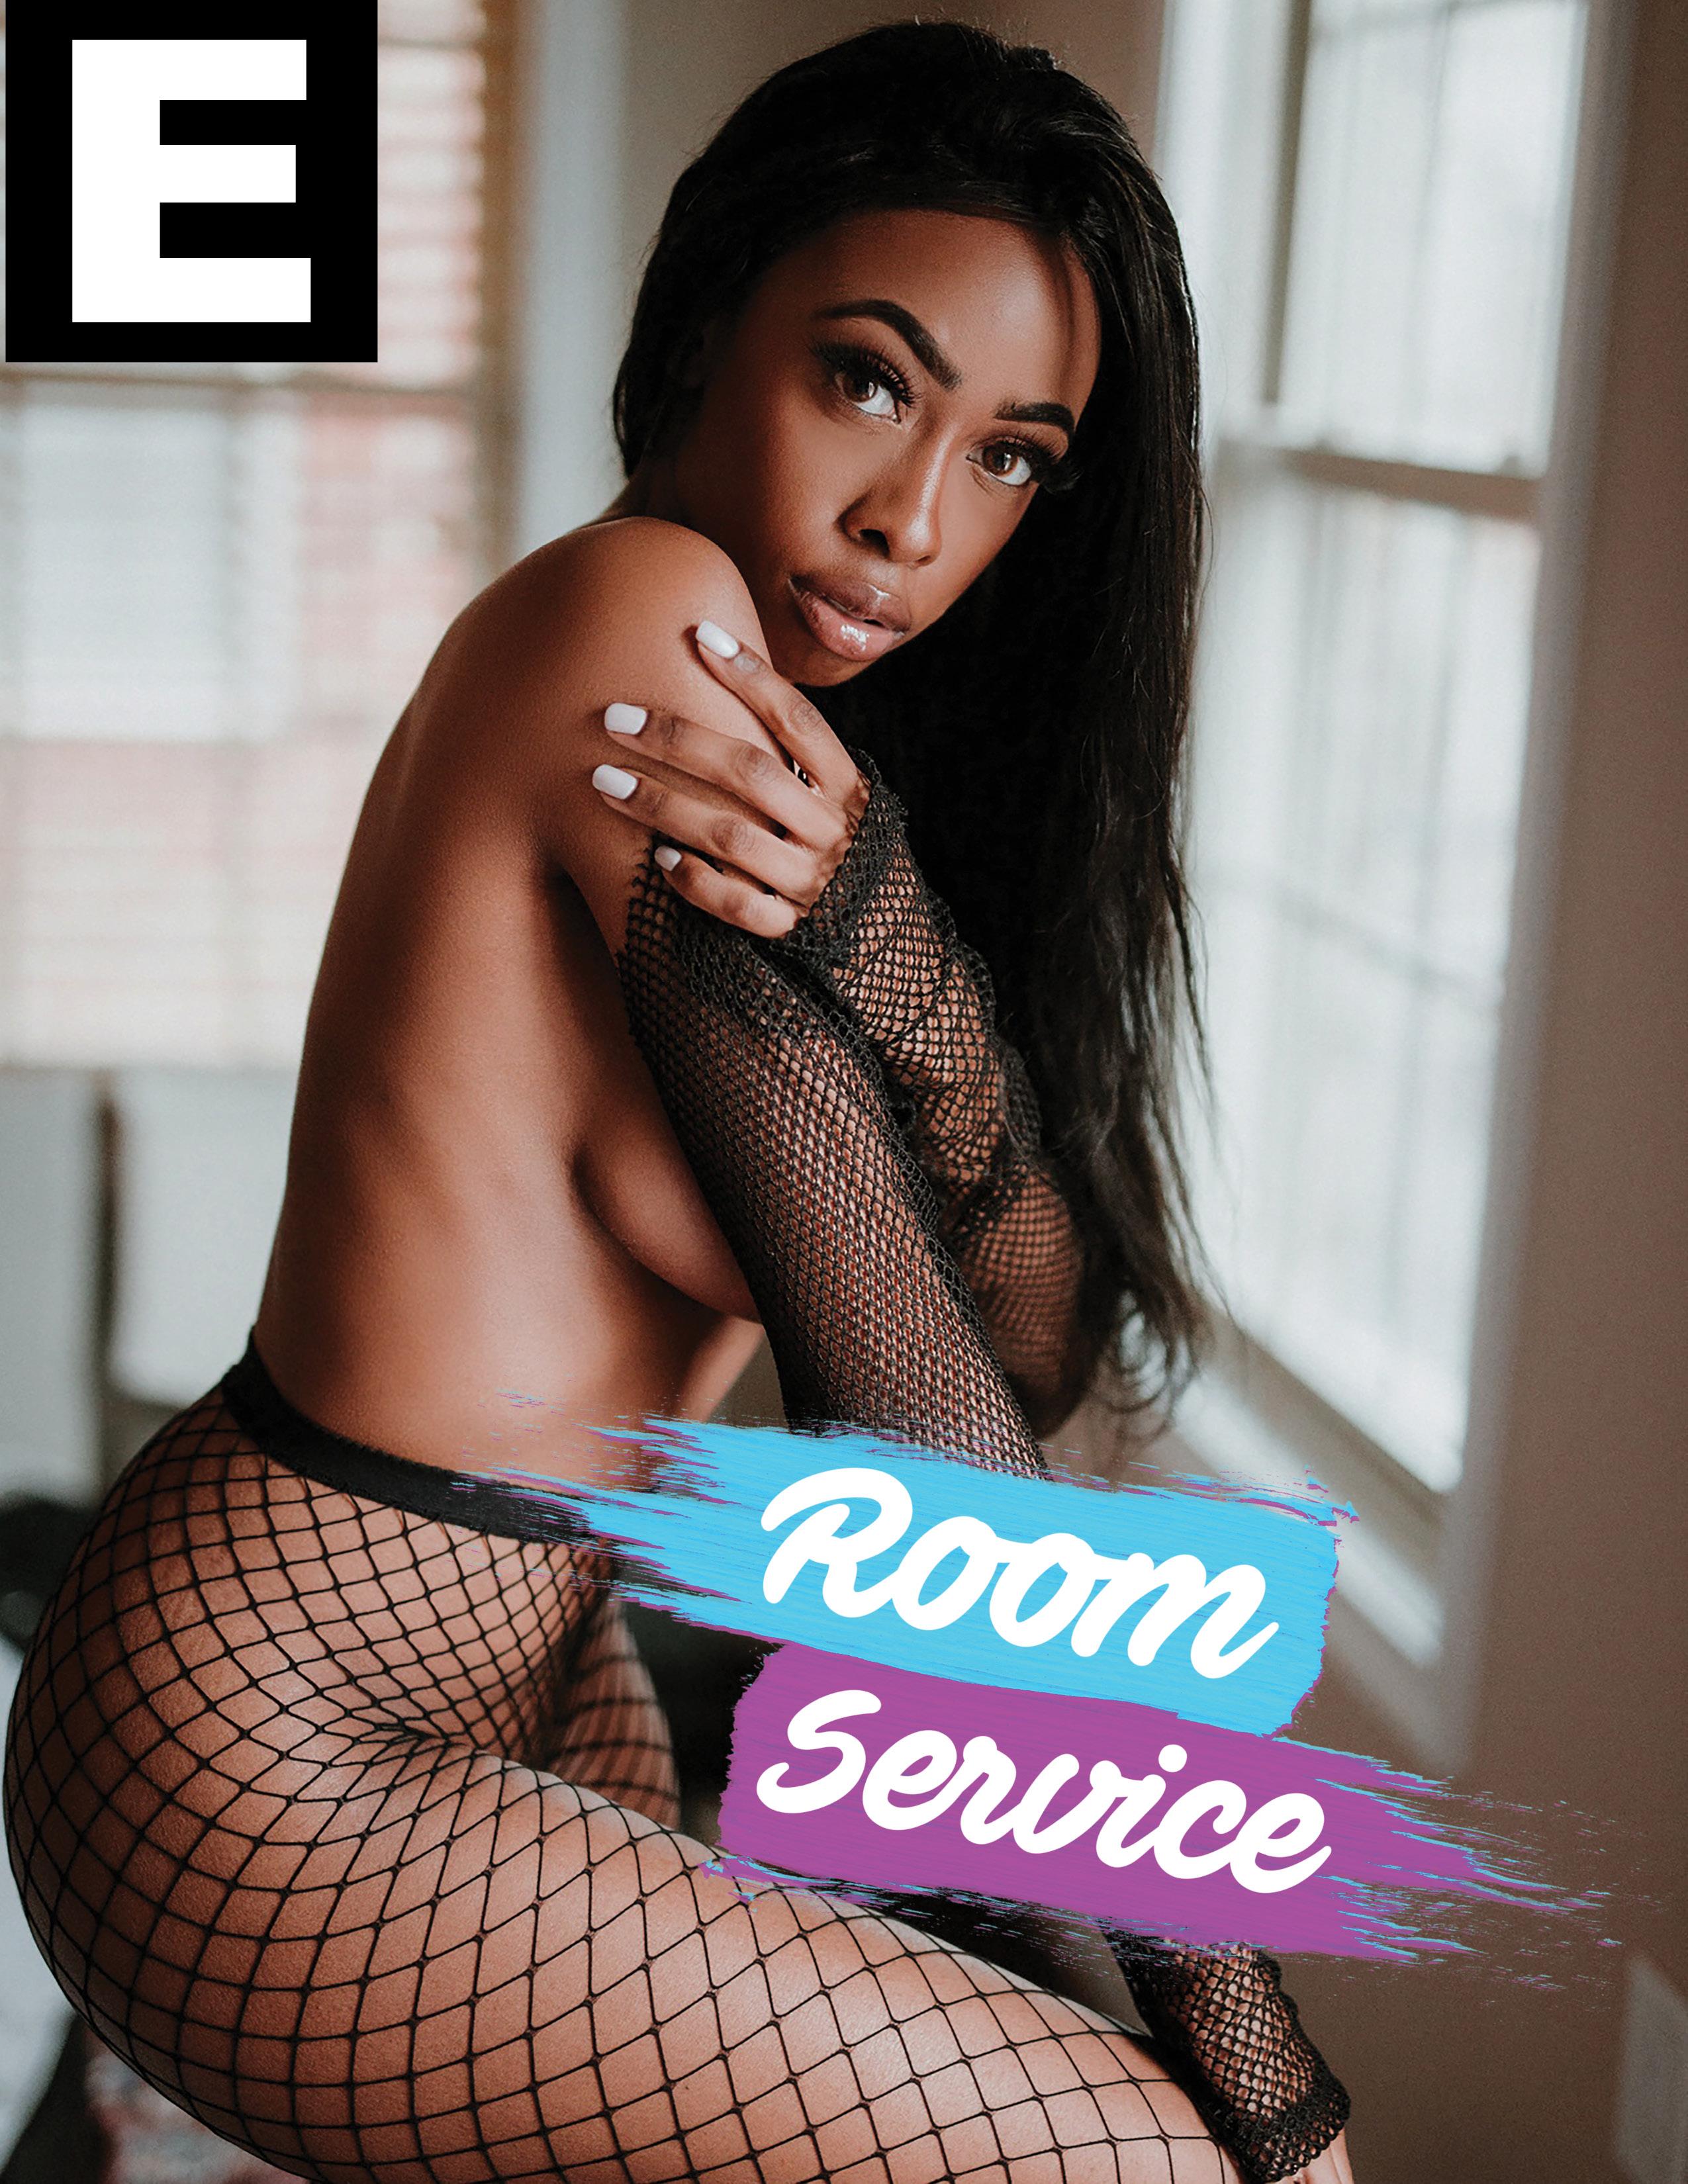 ENDEE Magazine ROOM SERVICE 2